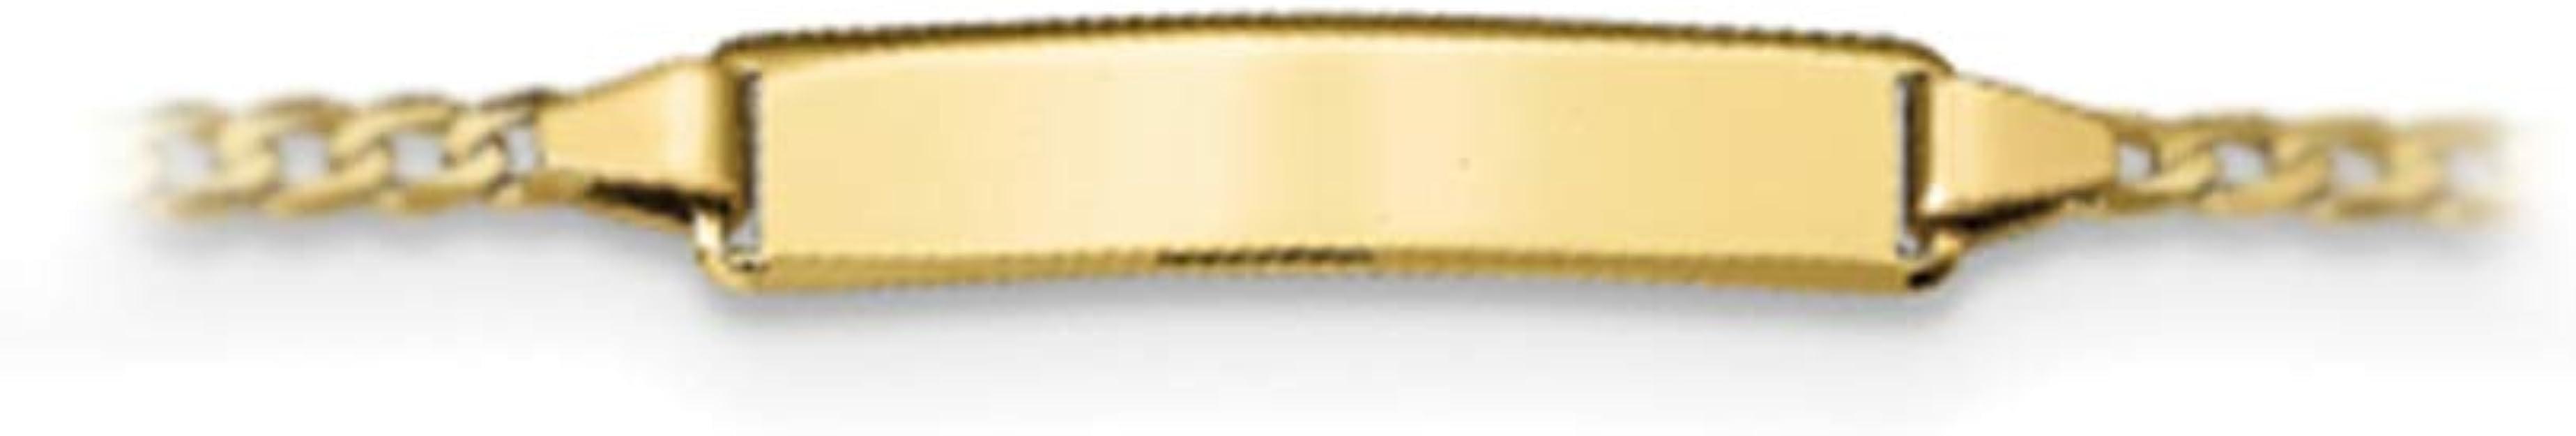 Brilliant Bijou 10k Yellow Gold Semi-Solid Curb Link ID Bracelet 6 inches